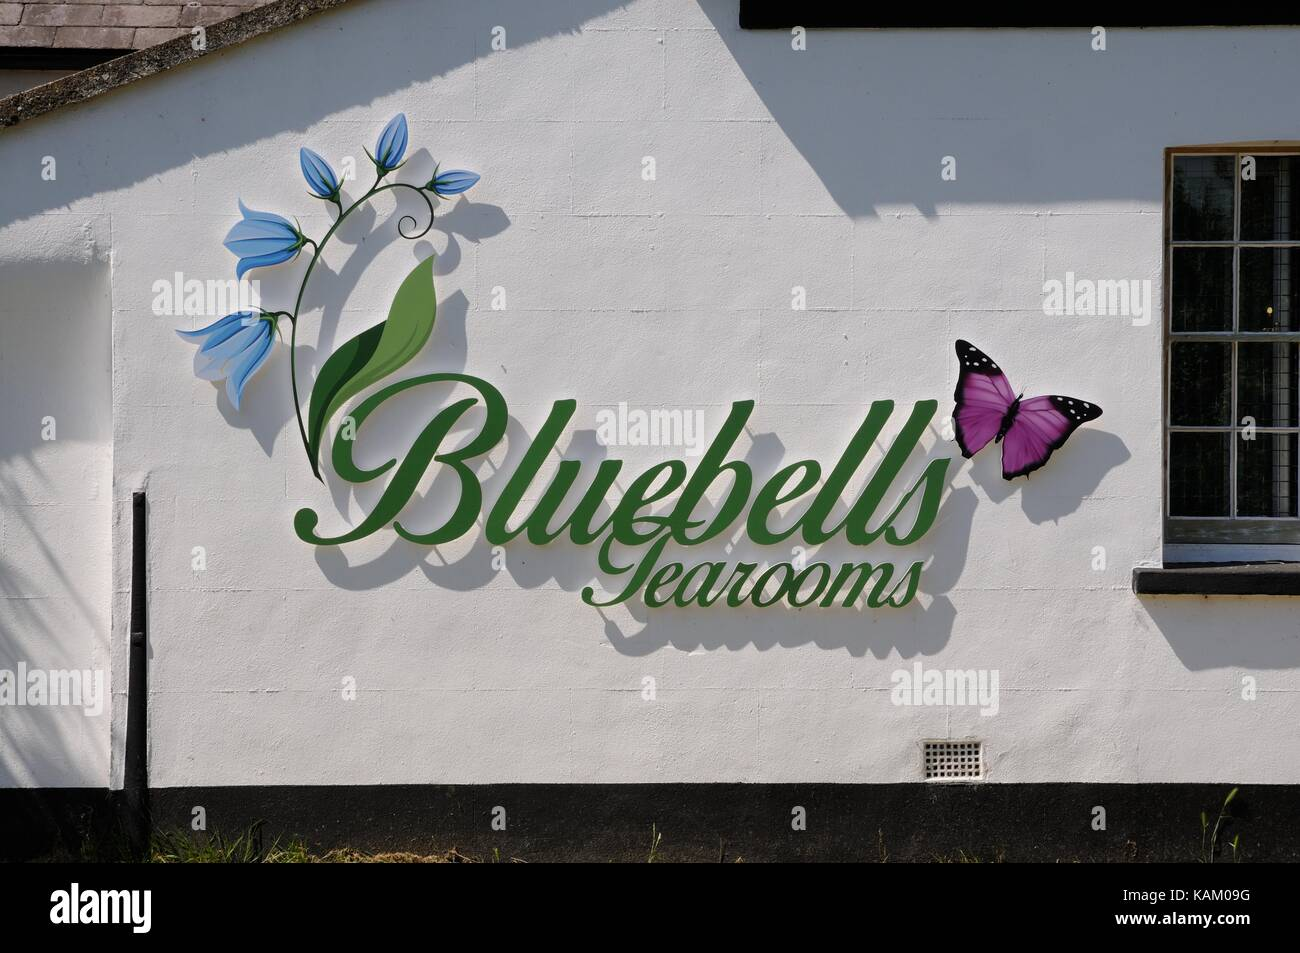 Bluebells Tearooms, Marsworth, Buckinghamshire Stock Photo